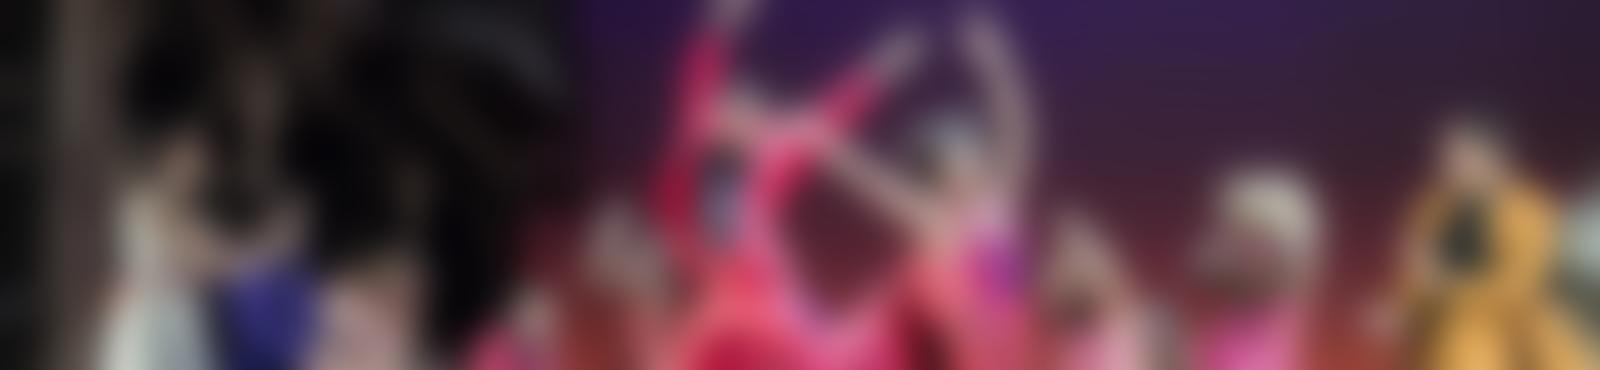 Blurred c525dbba e6a7 4b59 b446 8693ff0a648c